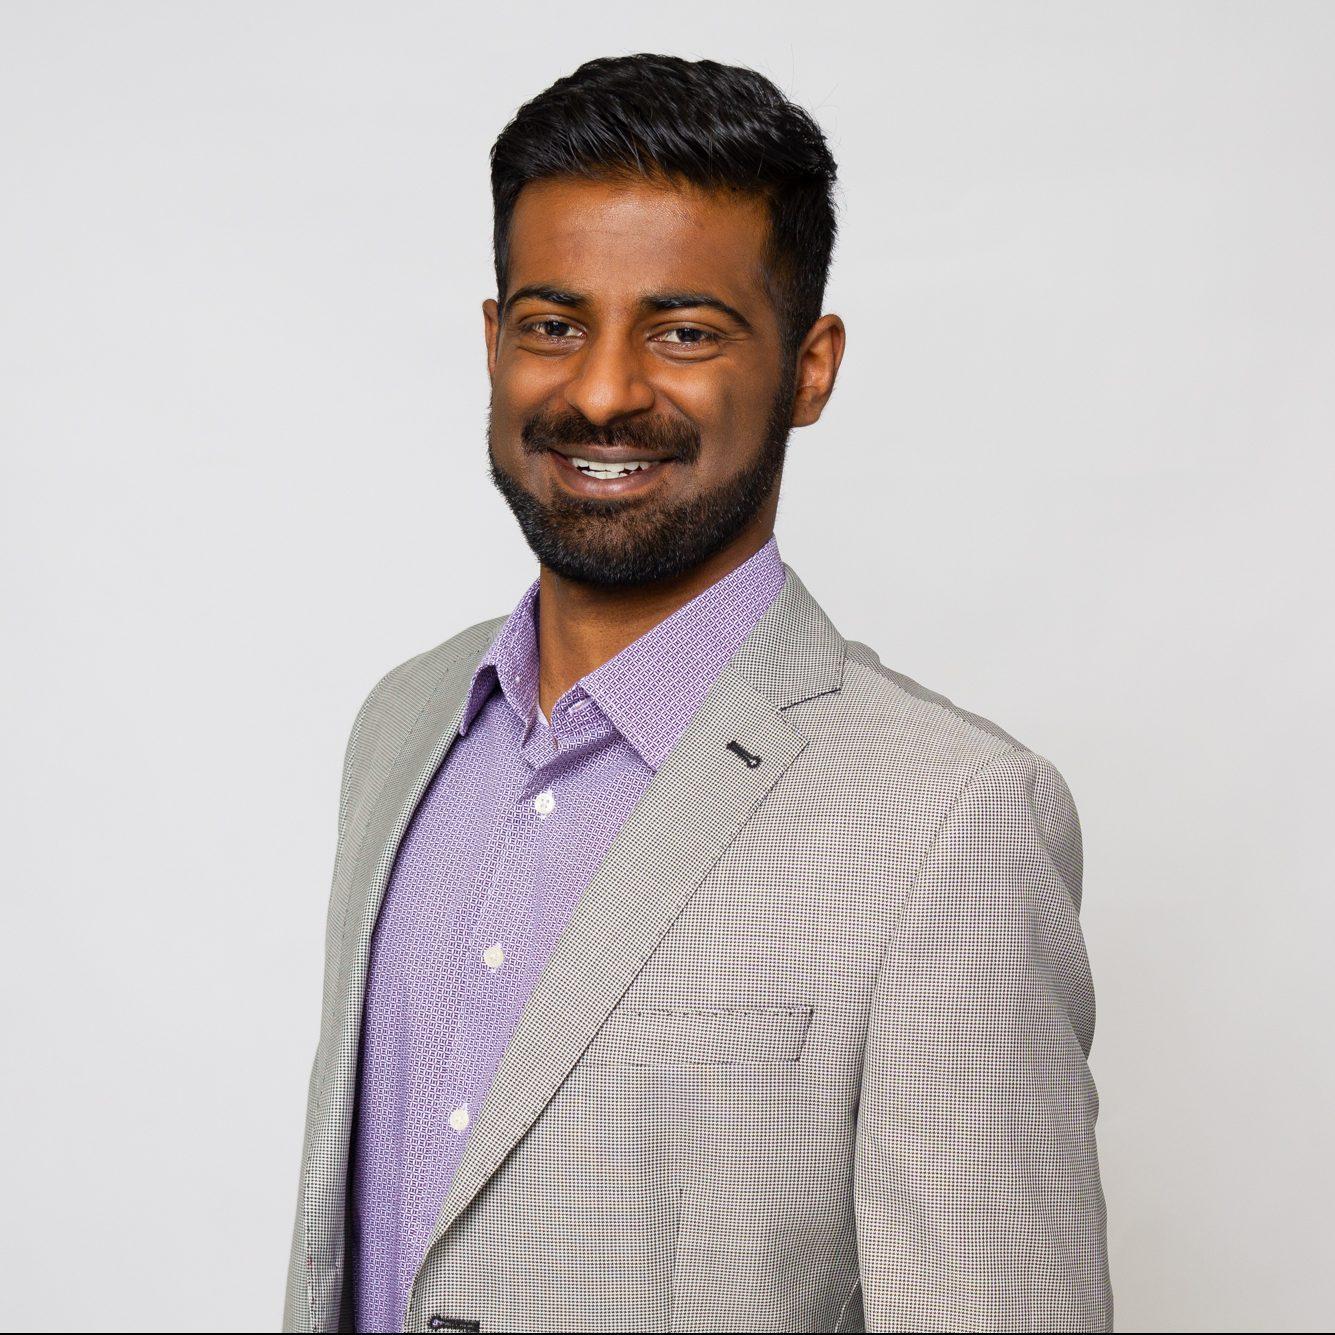 Niroshan Gajendra